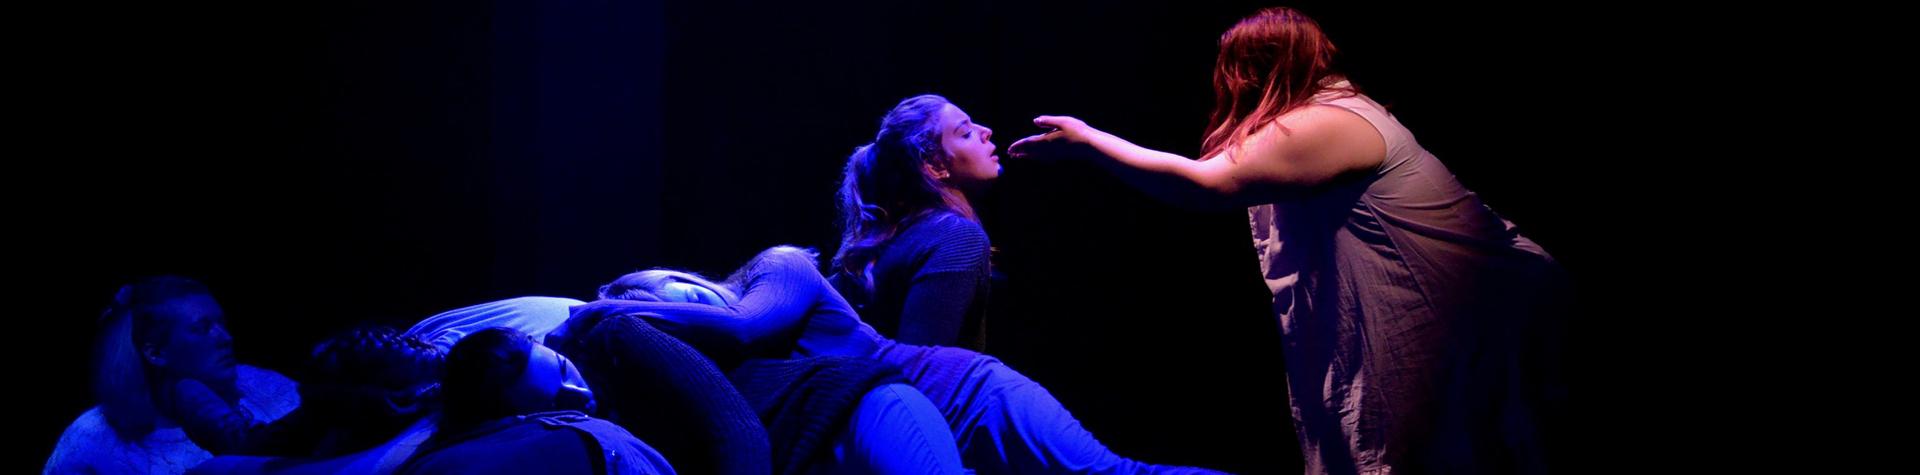 UCC School of Performing Arts